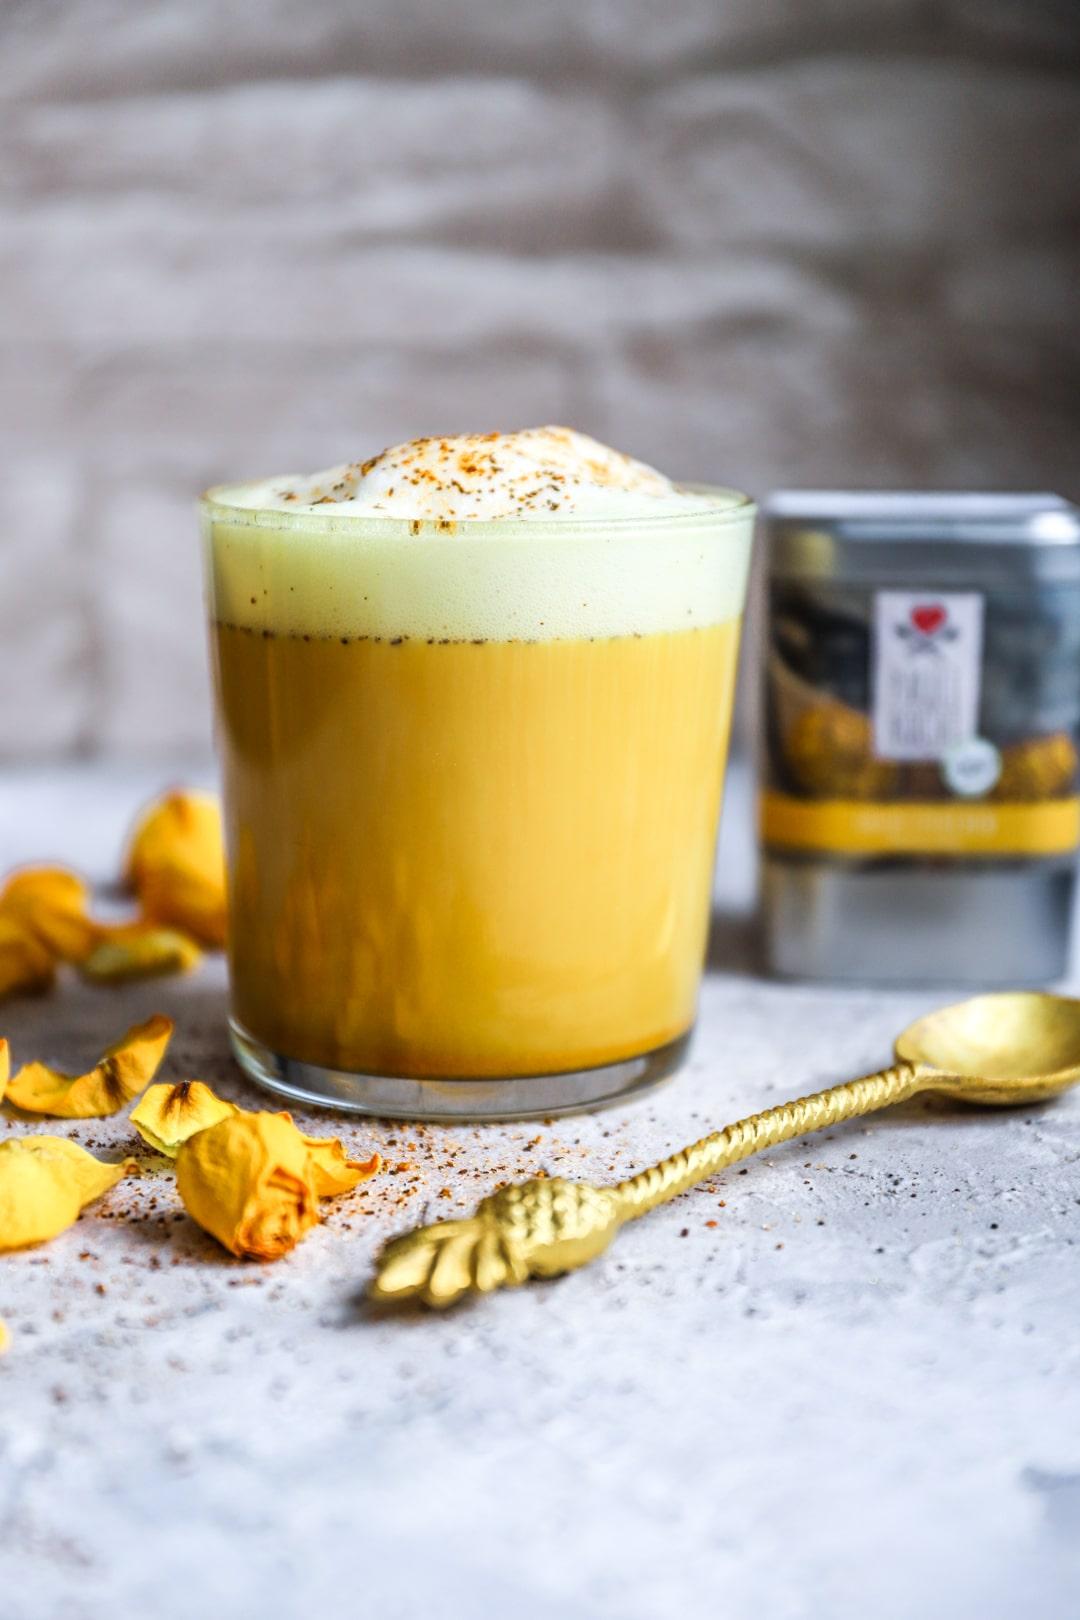 Golden_Milk_Goldstuckchen-3-min